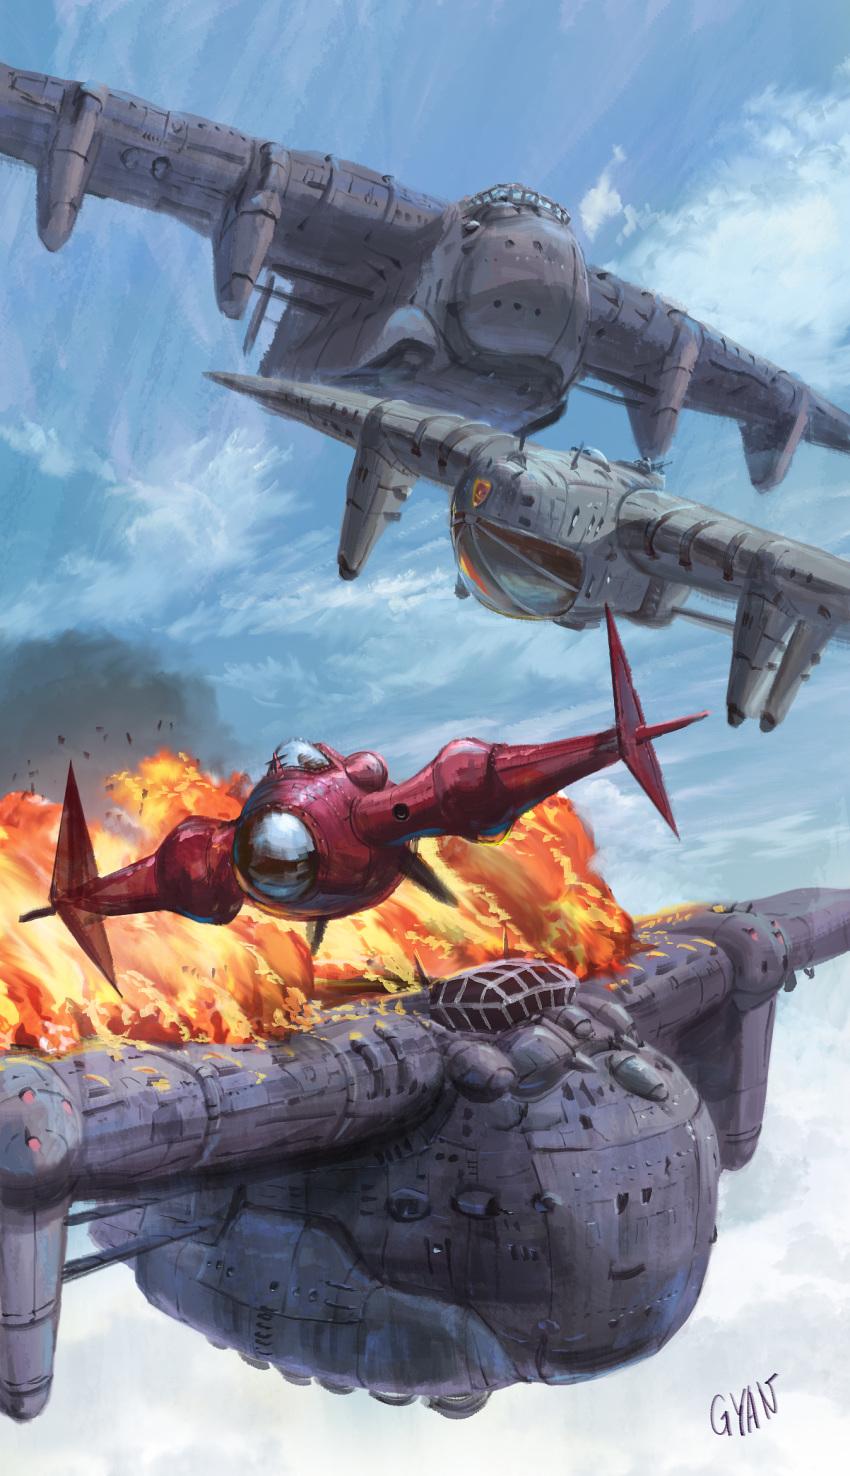 aerial_battle aircraft airplane asbel_(nausicaa) battle clouds dogfight fire flying gyan_(akenosuisei) highres kaze_no_tani_no_nausicaa military signature sky studio_ghibli war